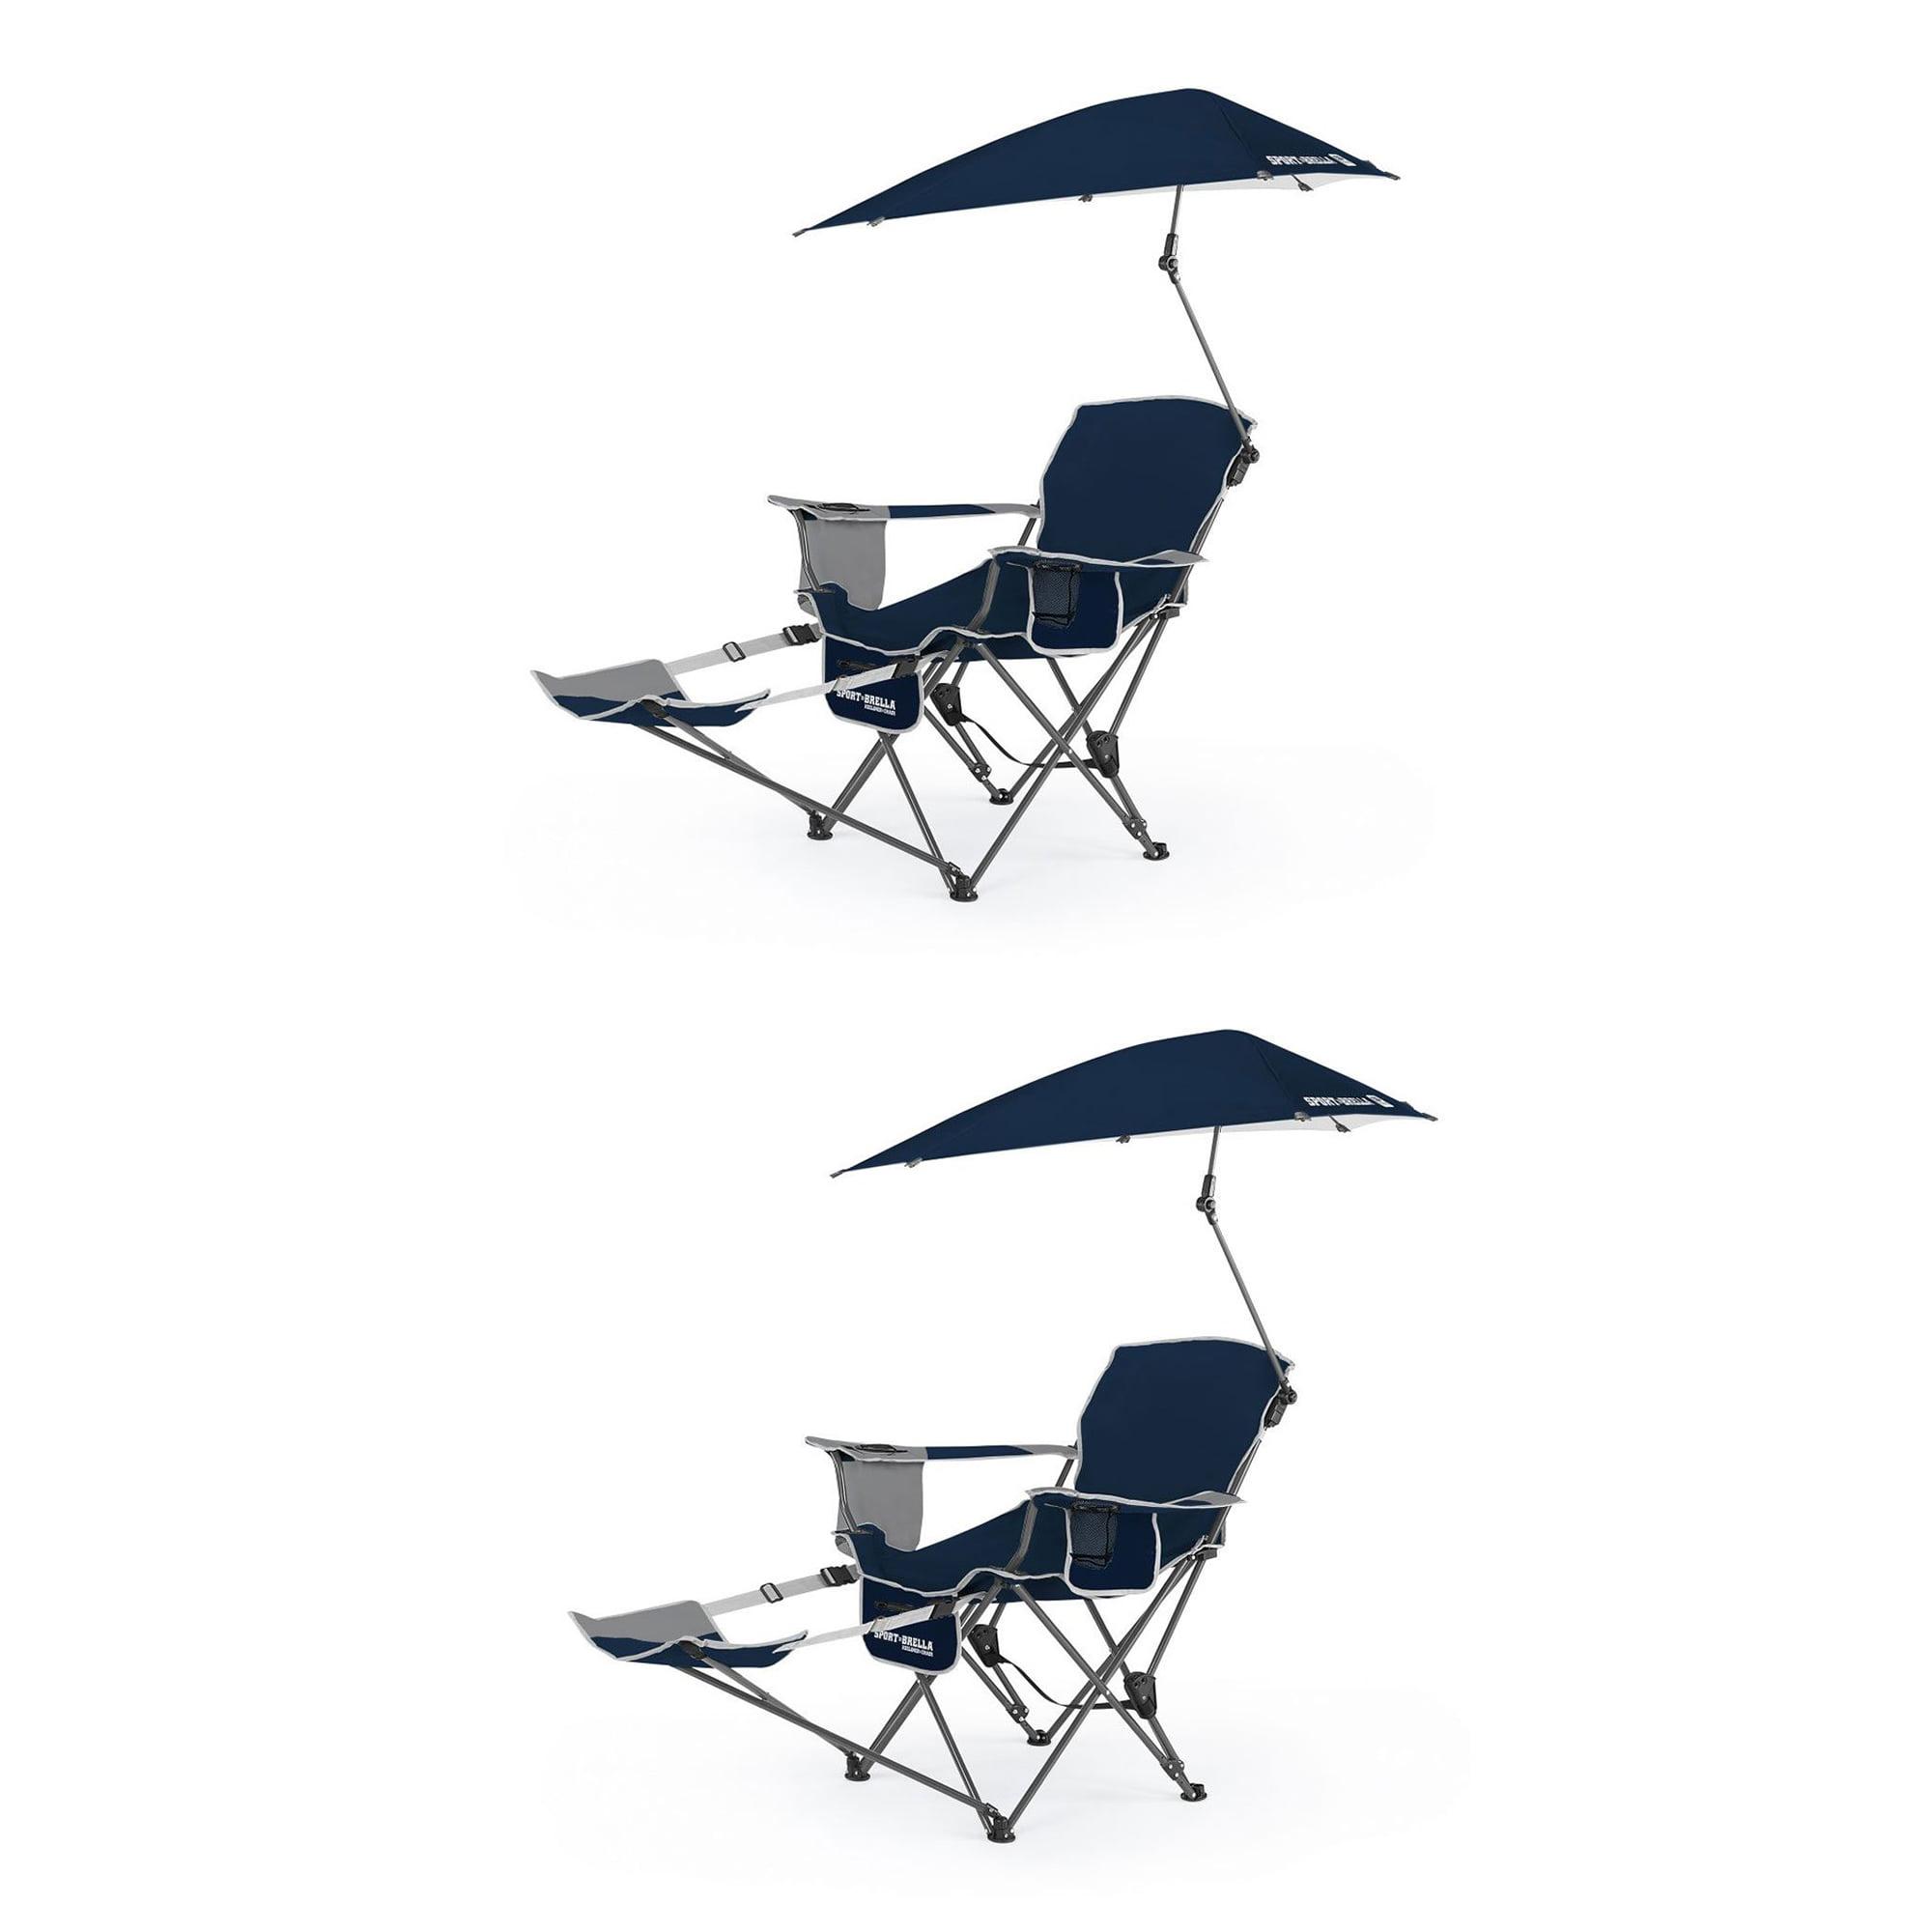 Sport Brella Portable Sun Shelter Umbrella Recliner Folding Chair, Blue (2 Pack) by Sport-Brella